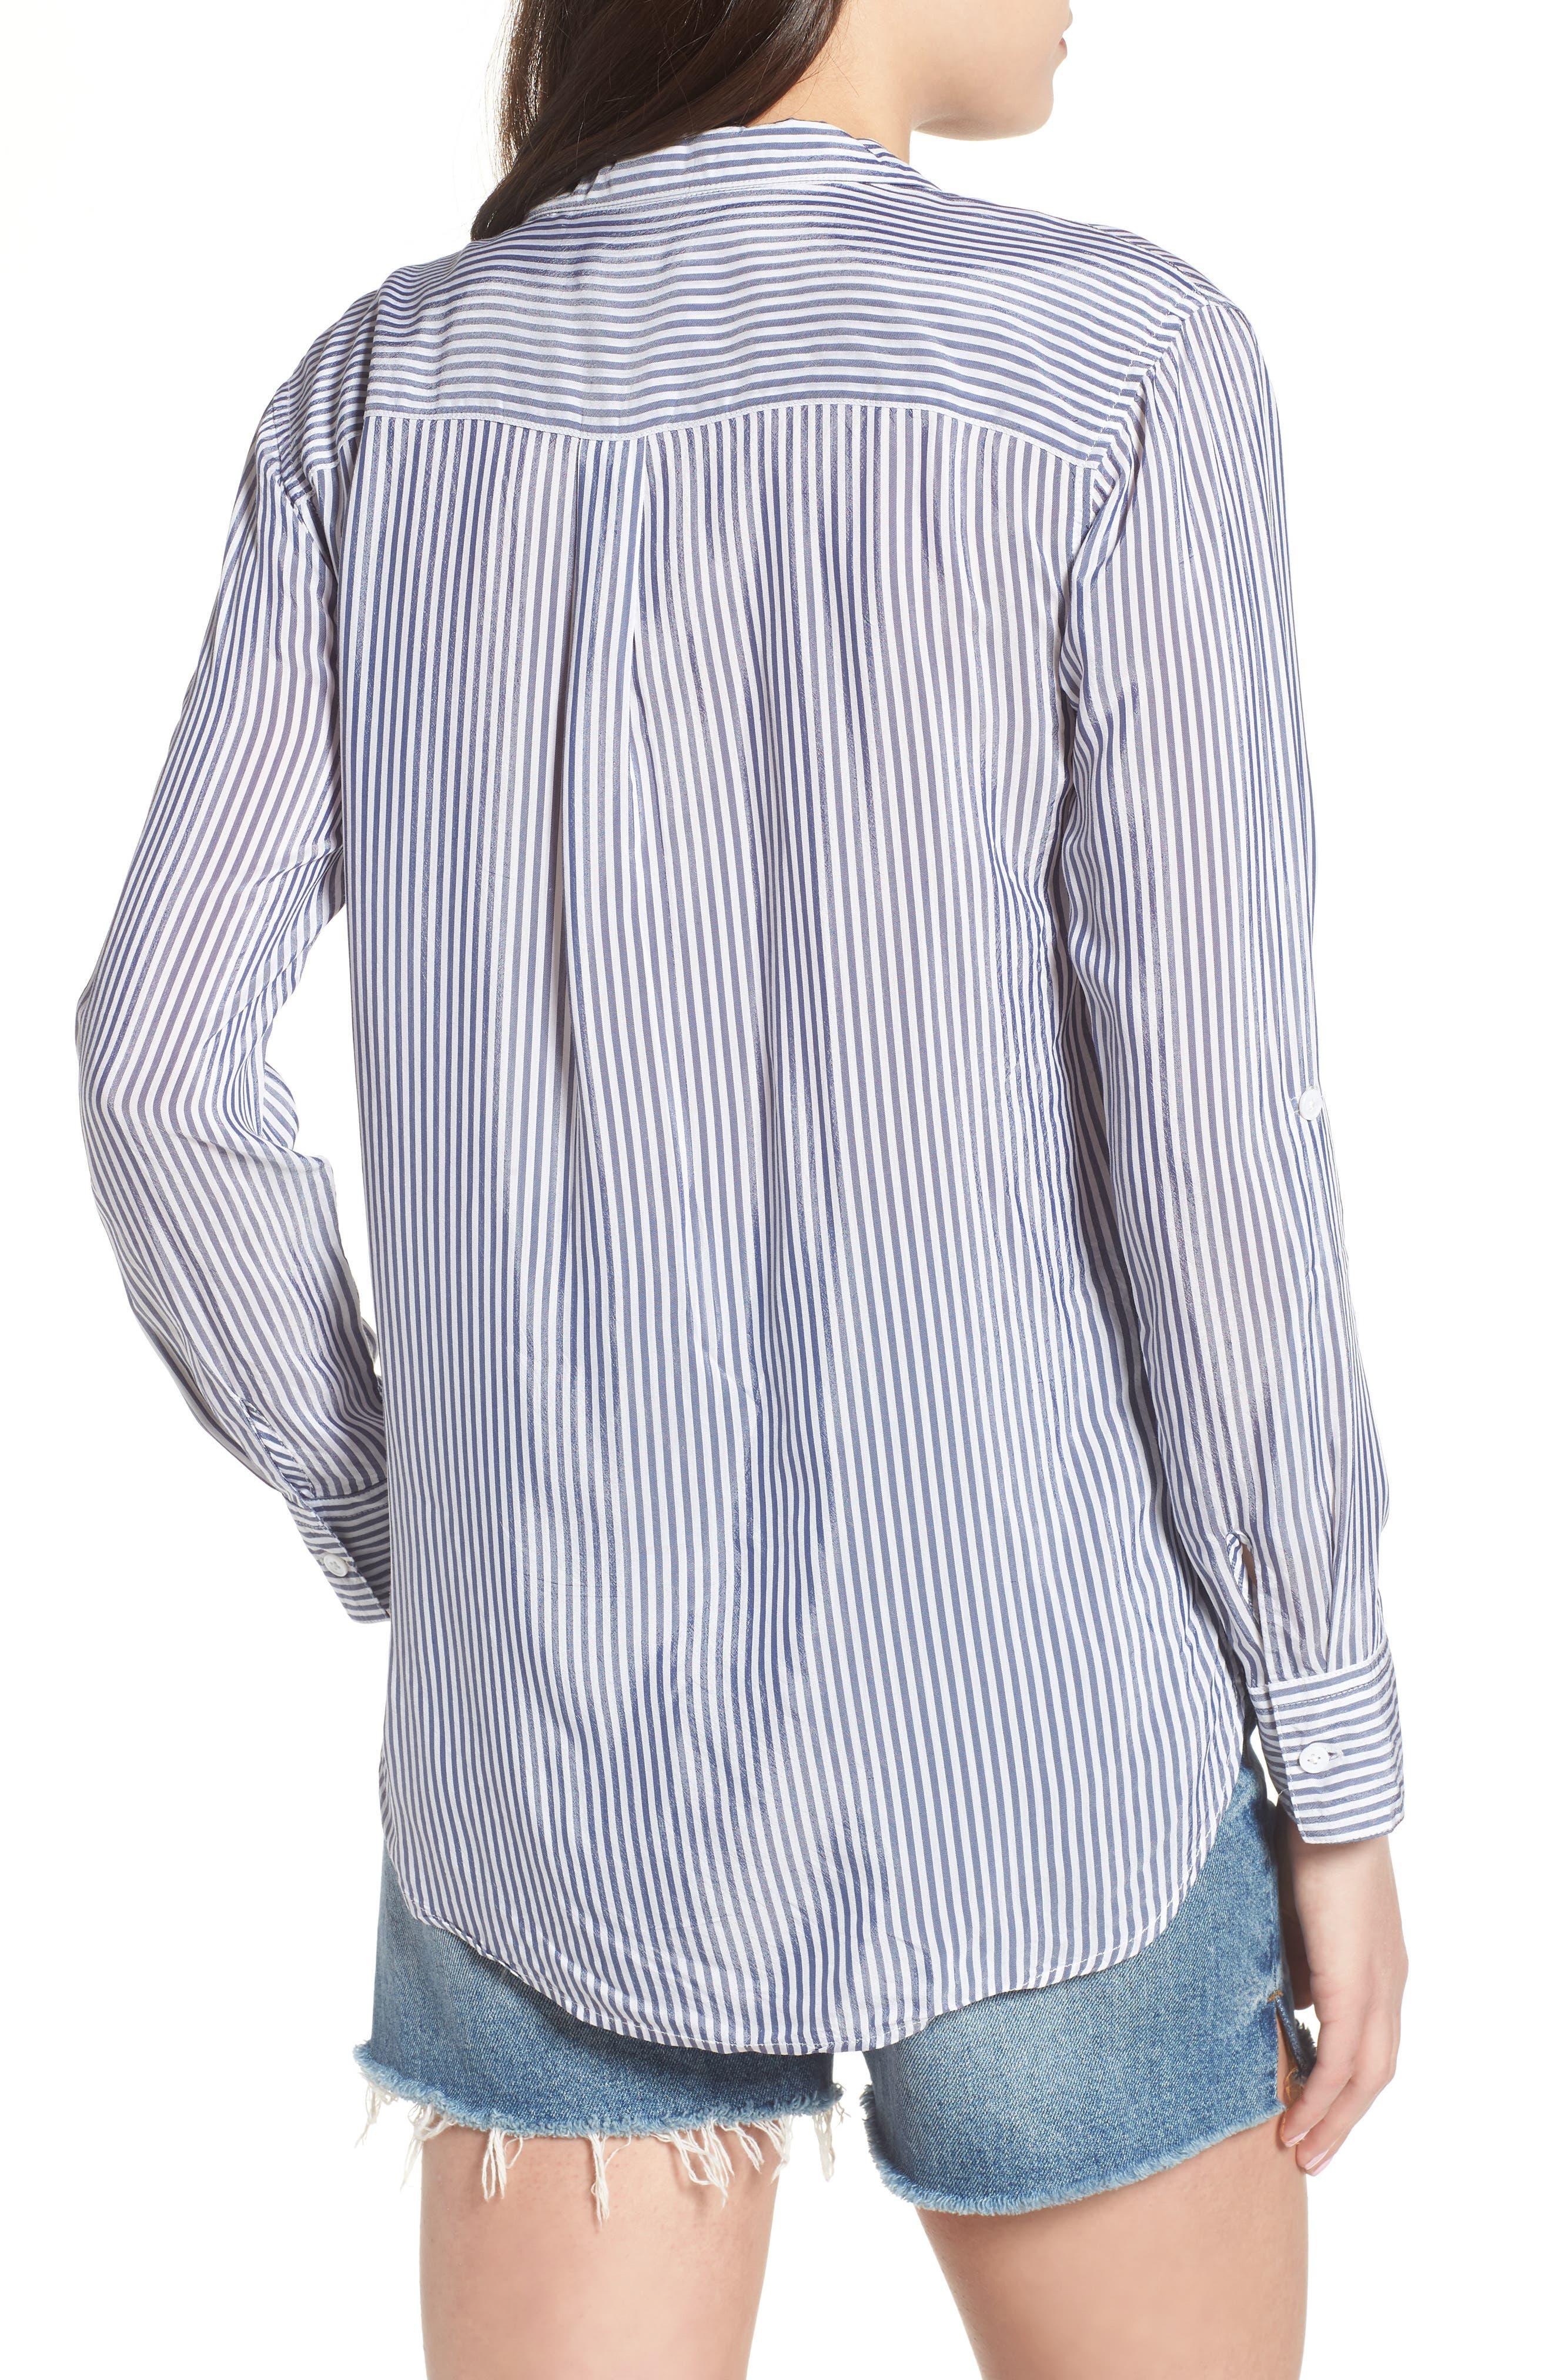 Zinc Stripe Shirt,                             Alternate thumbnail 2, color,